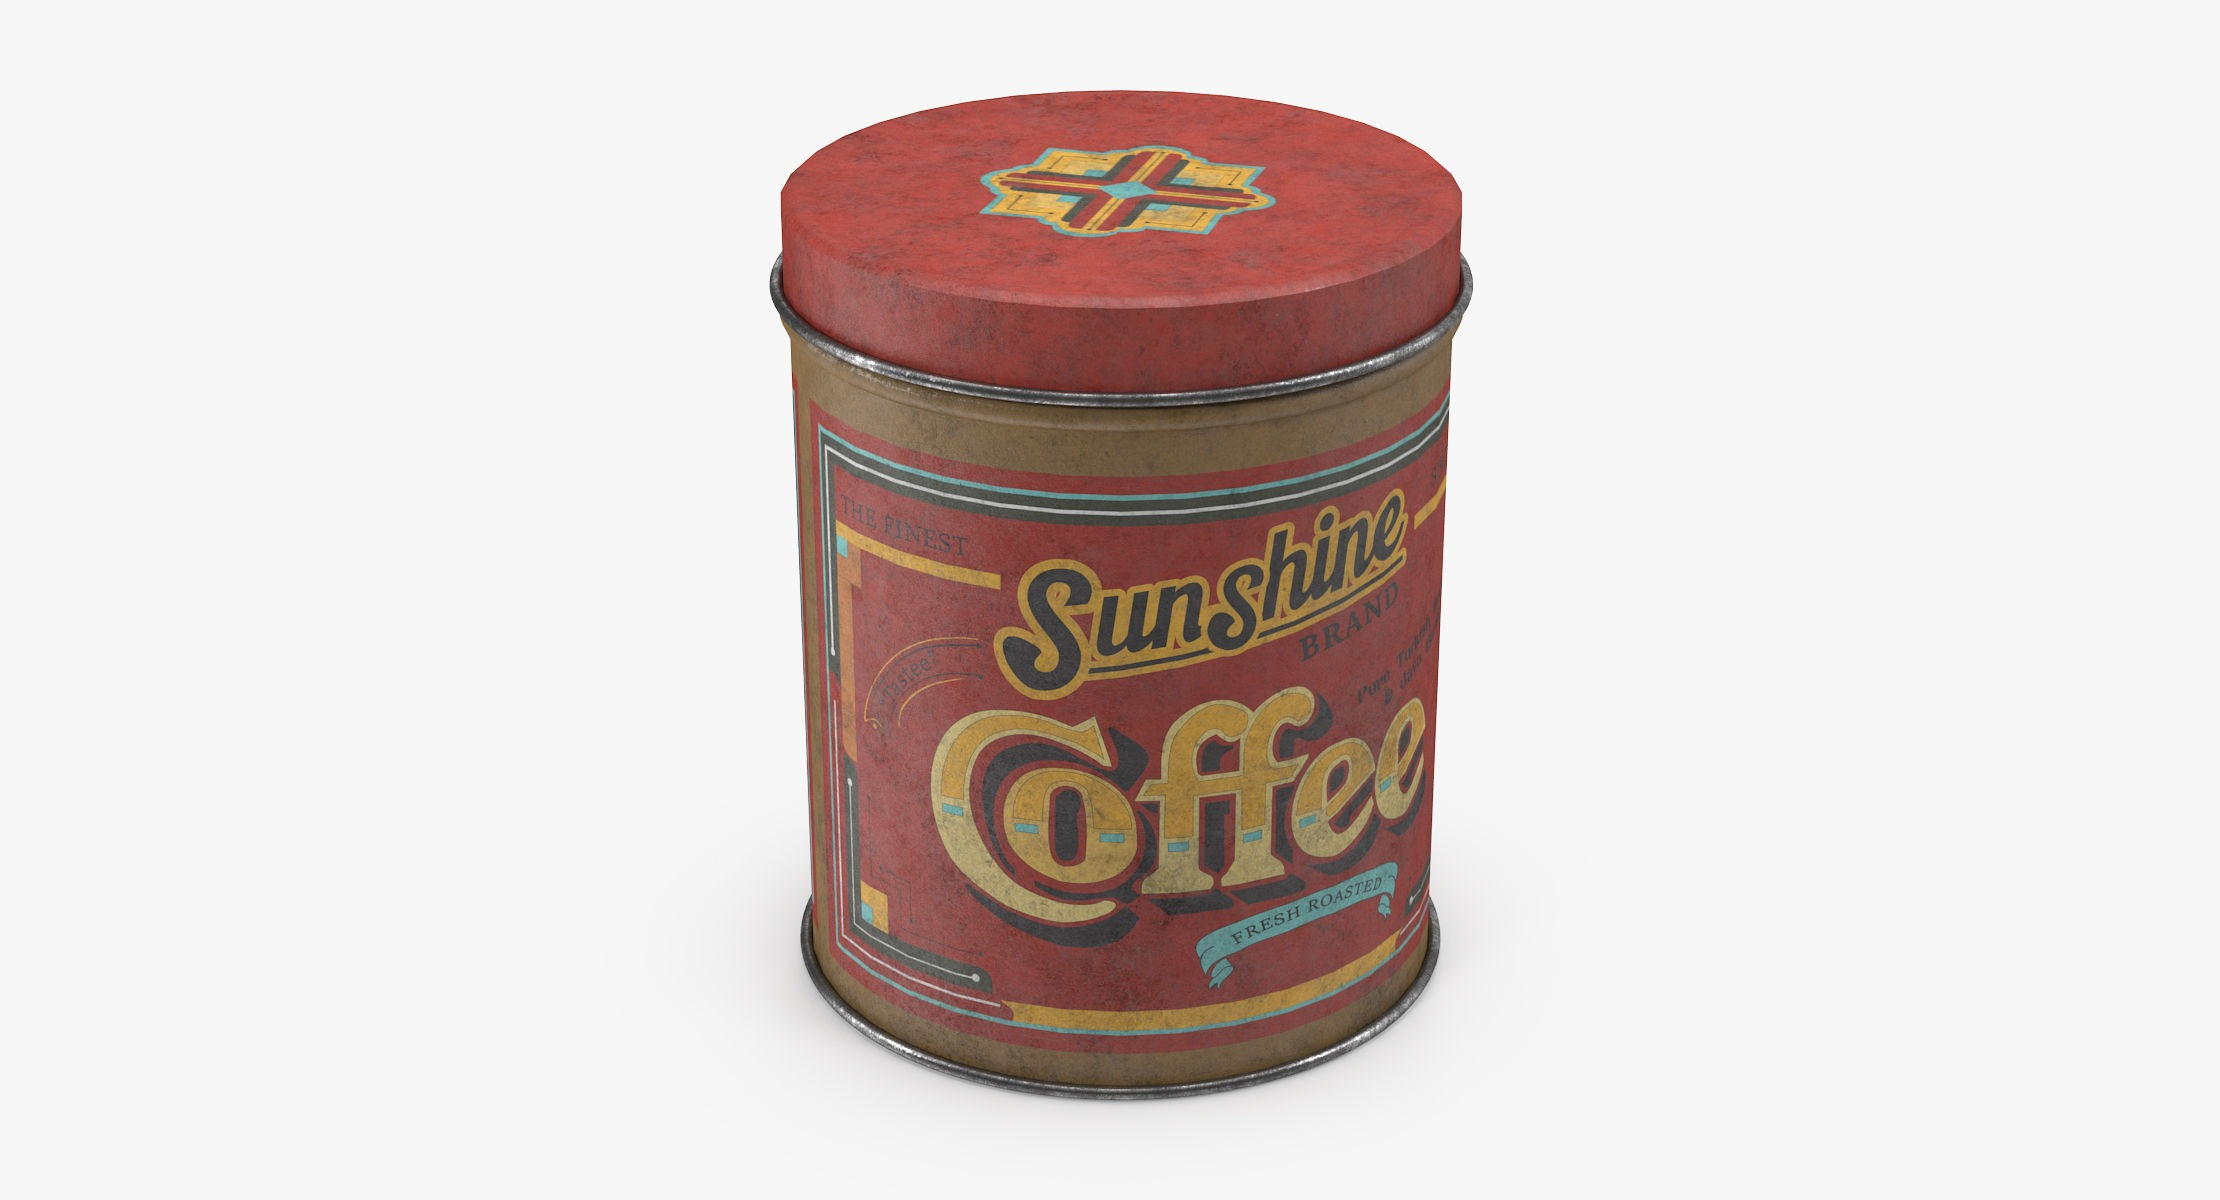 Vintage Metal Kitchen Tin Coffee - reel 1